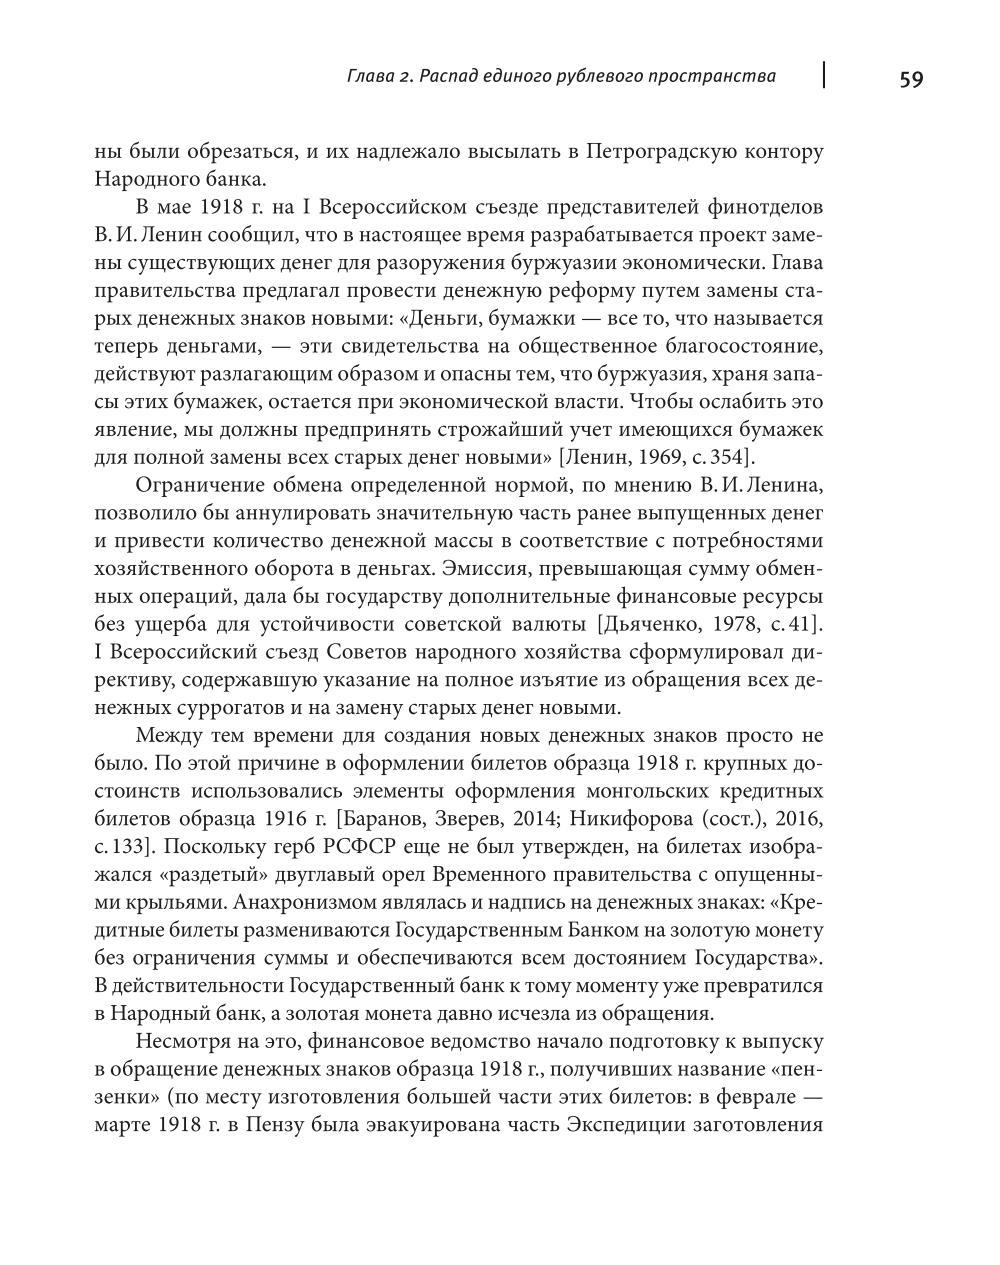 http://ipic.su/img/img7/fs/3.1597308632.jpg